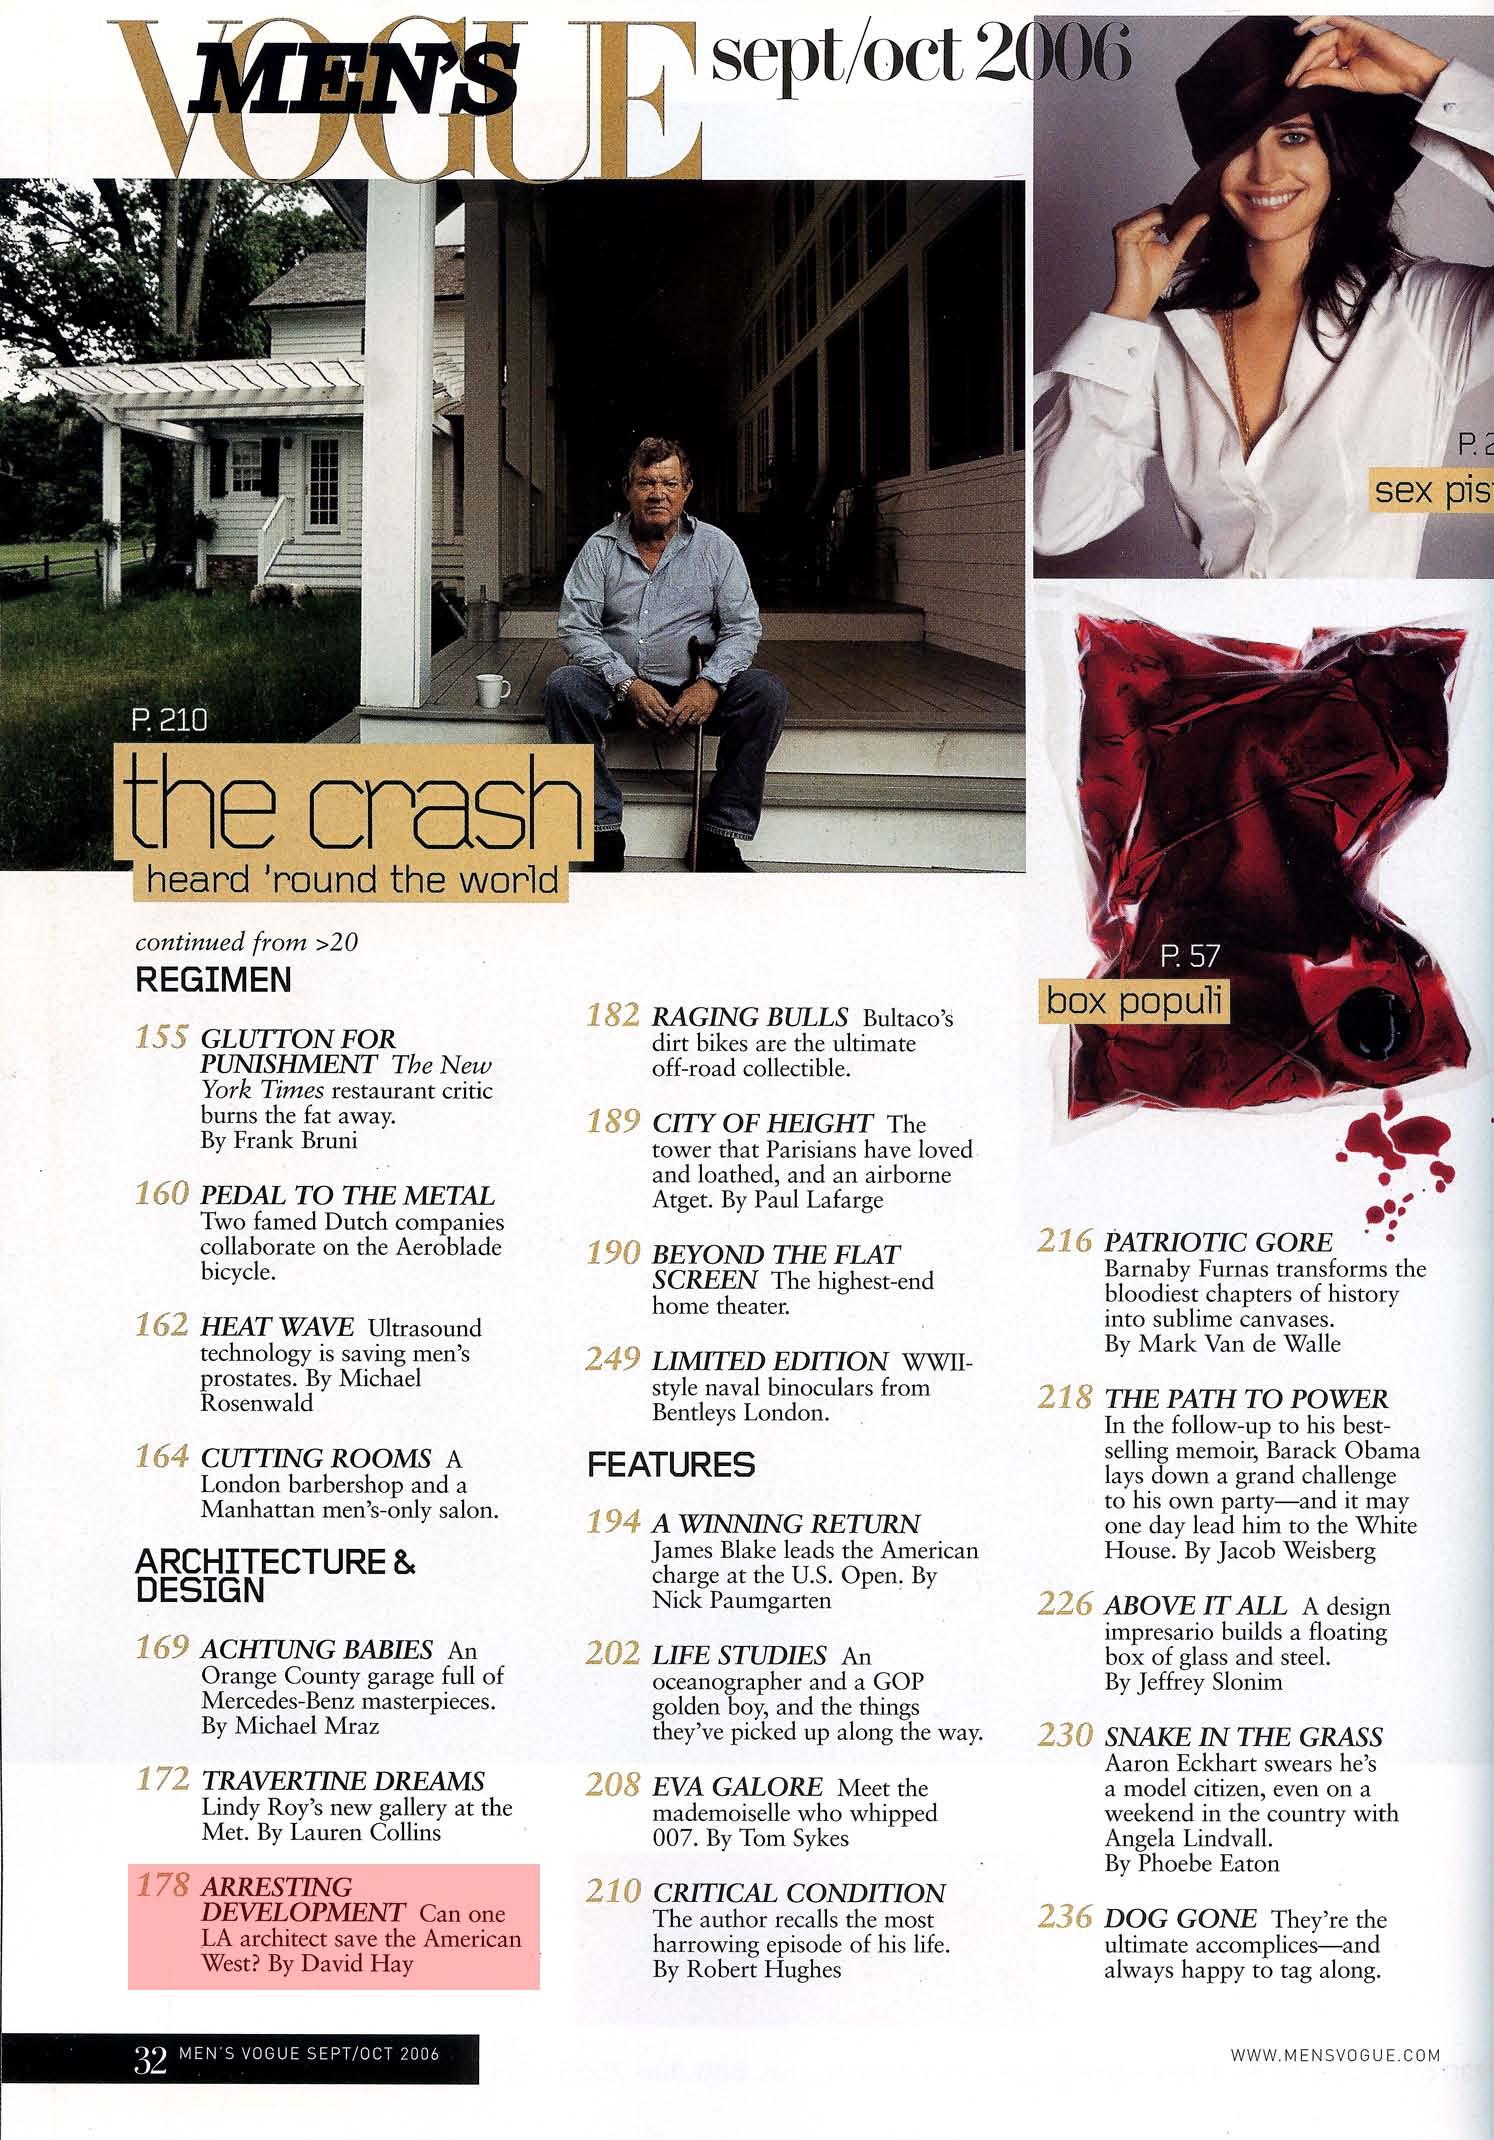 Mens_Vogue_0806_Page_2.jpg